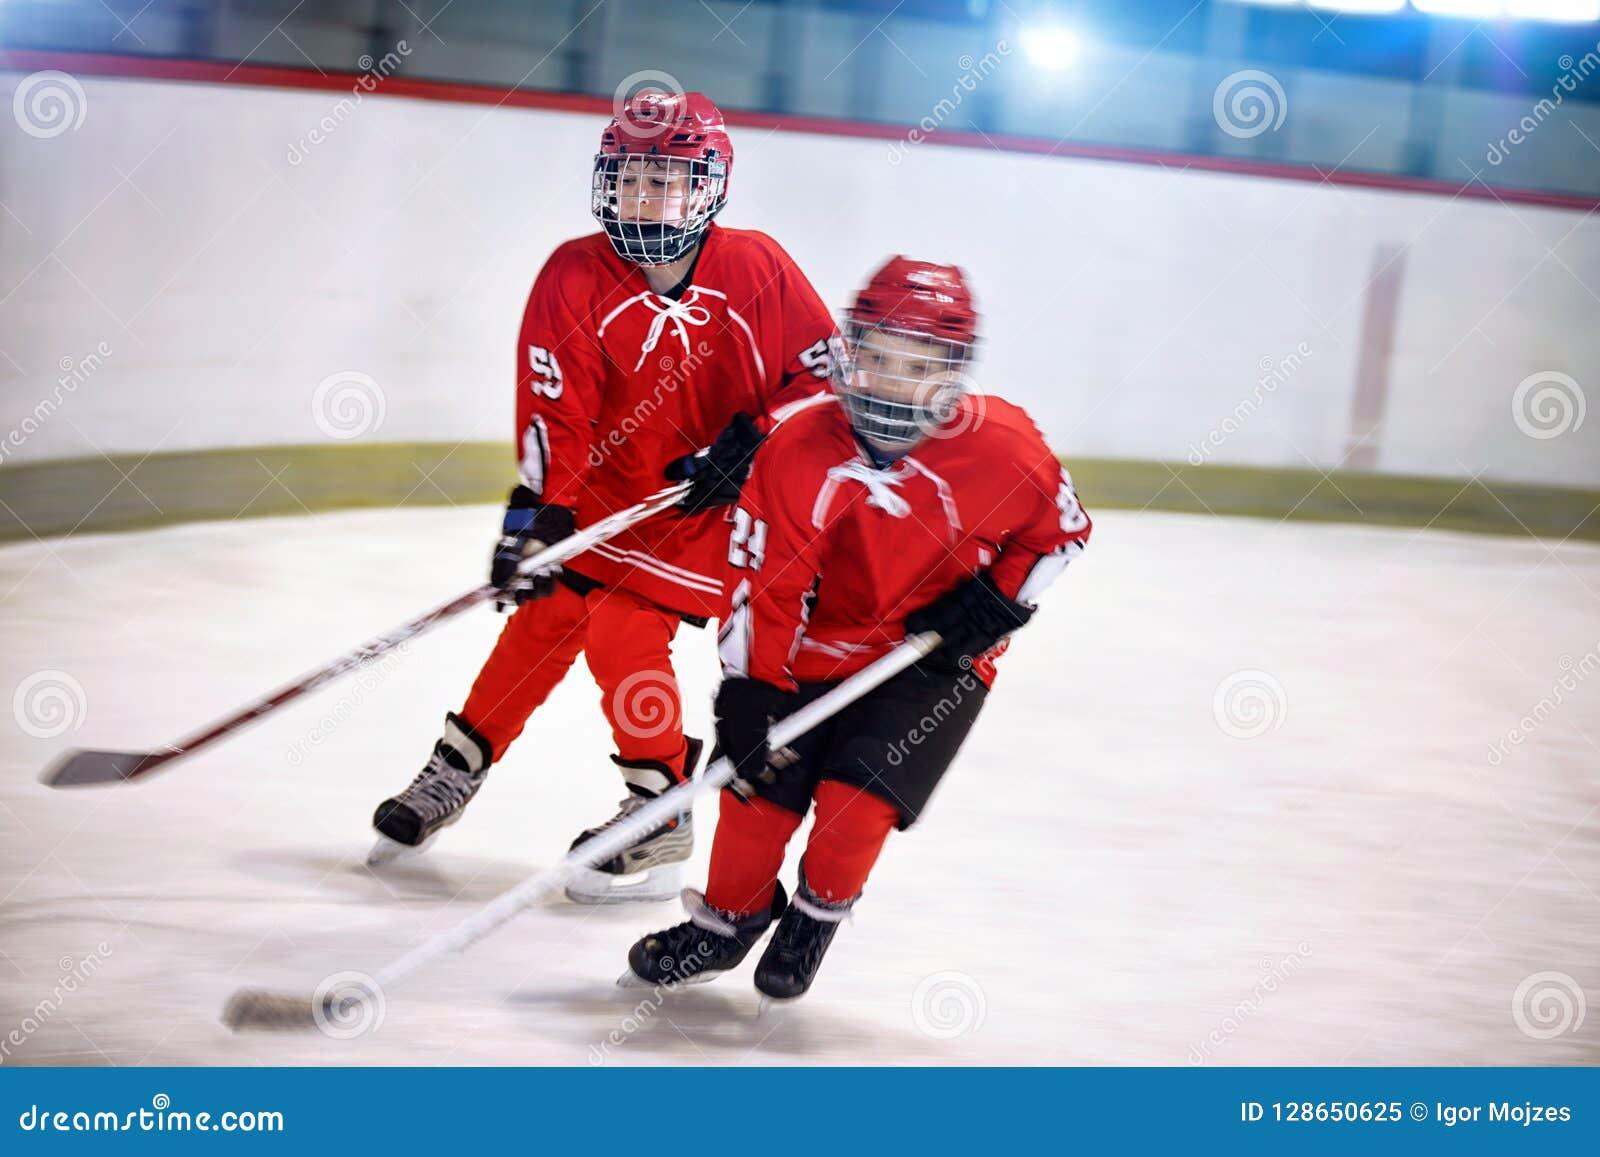 Hockey youth boys players on ice